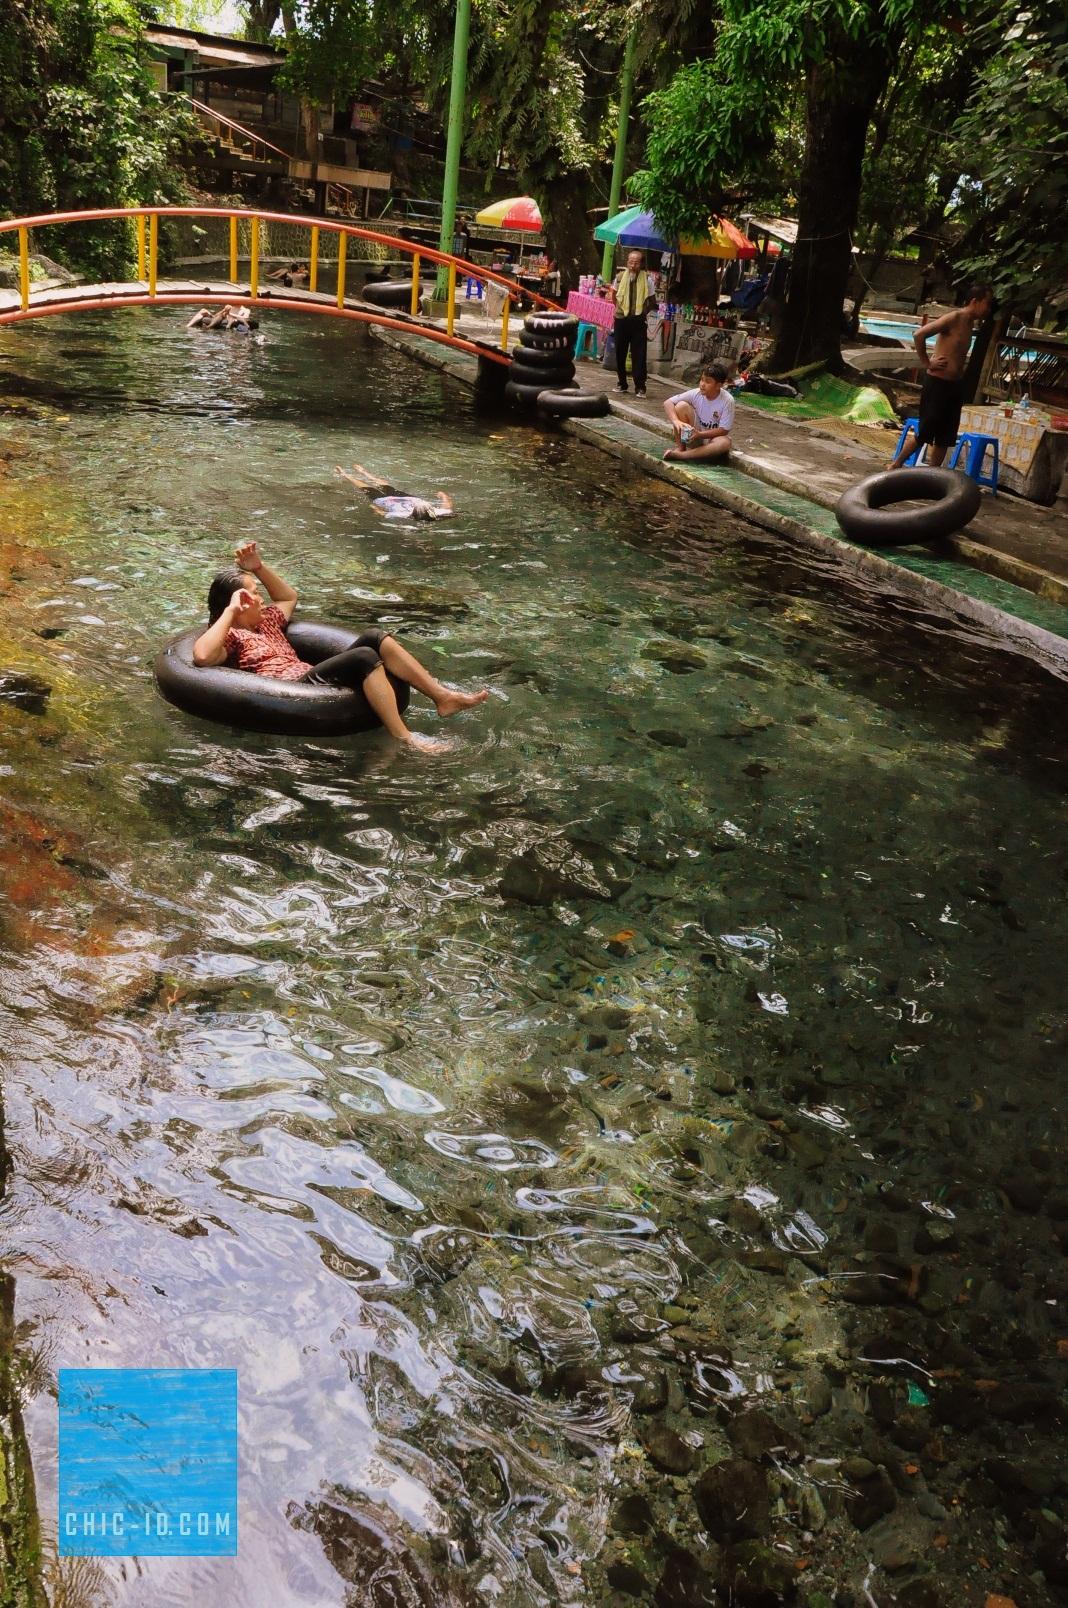 Dedi Obyek Wisata Mata Air Cokro Tulung Water Boom Umbul